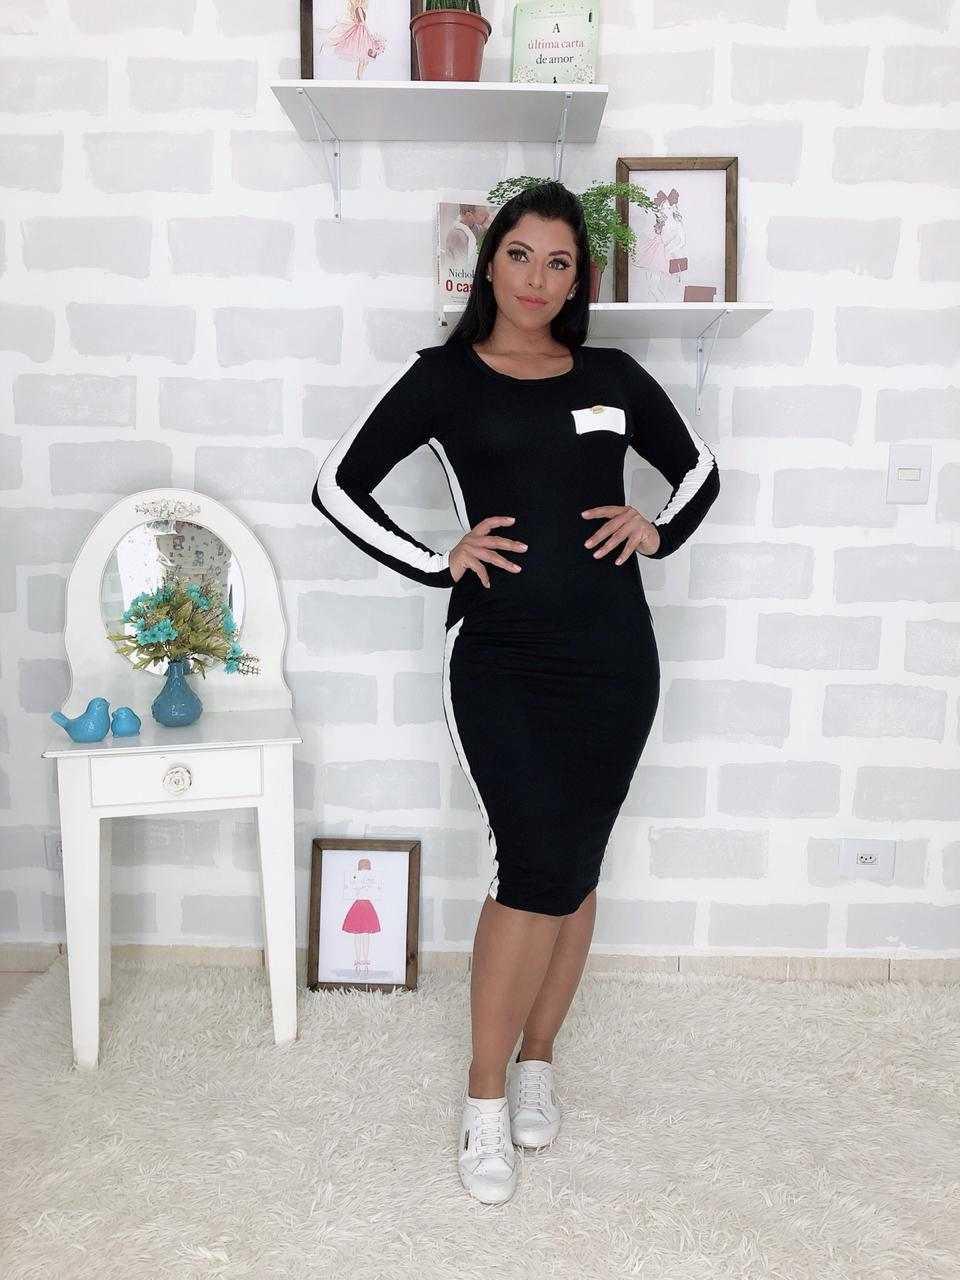 VESTIDO TUBINHO MANGA LONGA COM RECORTES  - FEMININE FASHION